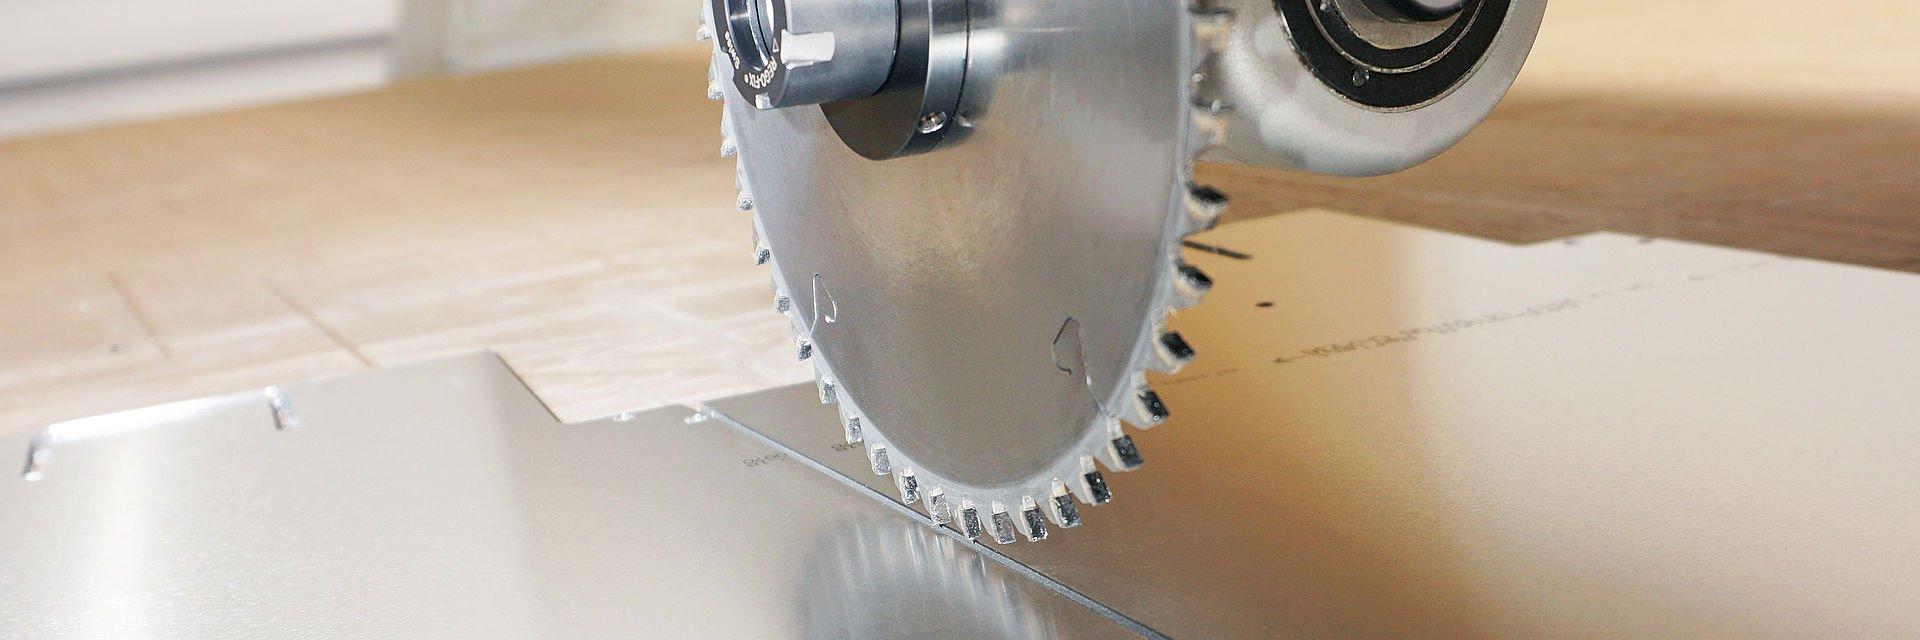 Cut Aluminum Composite Panels